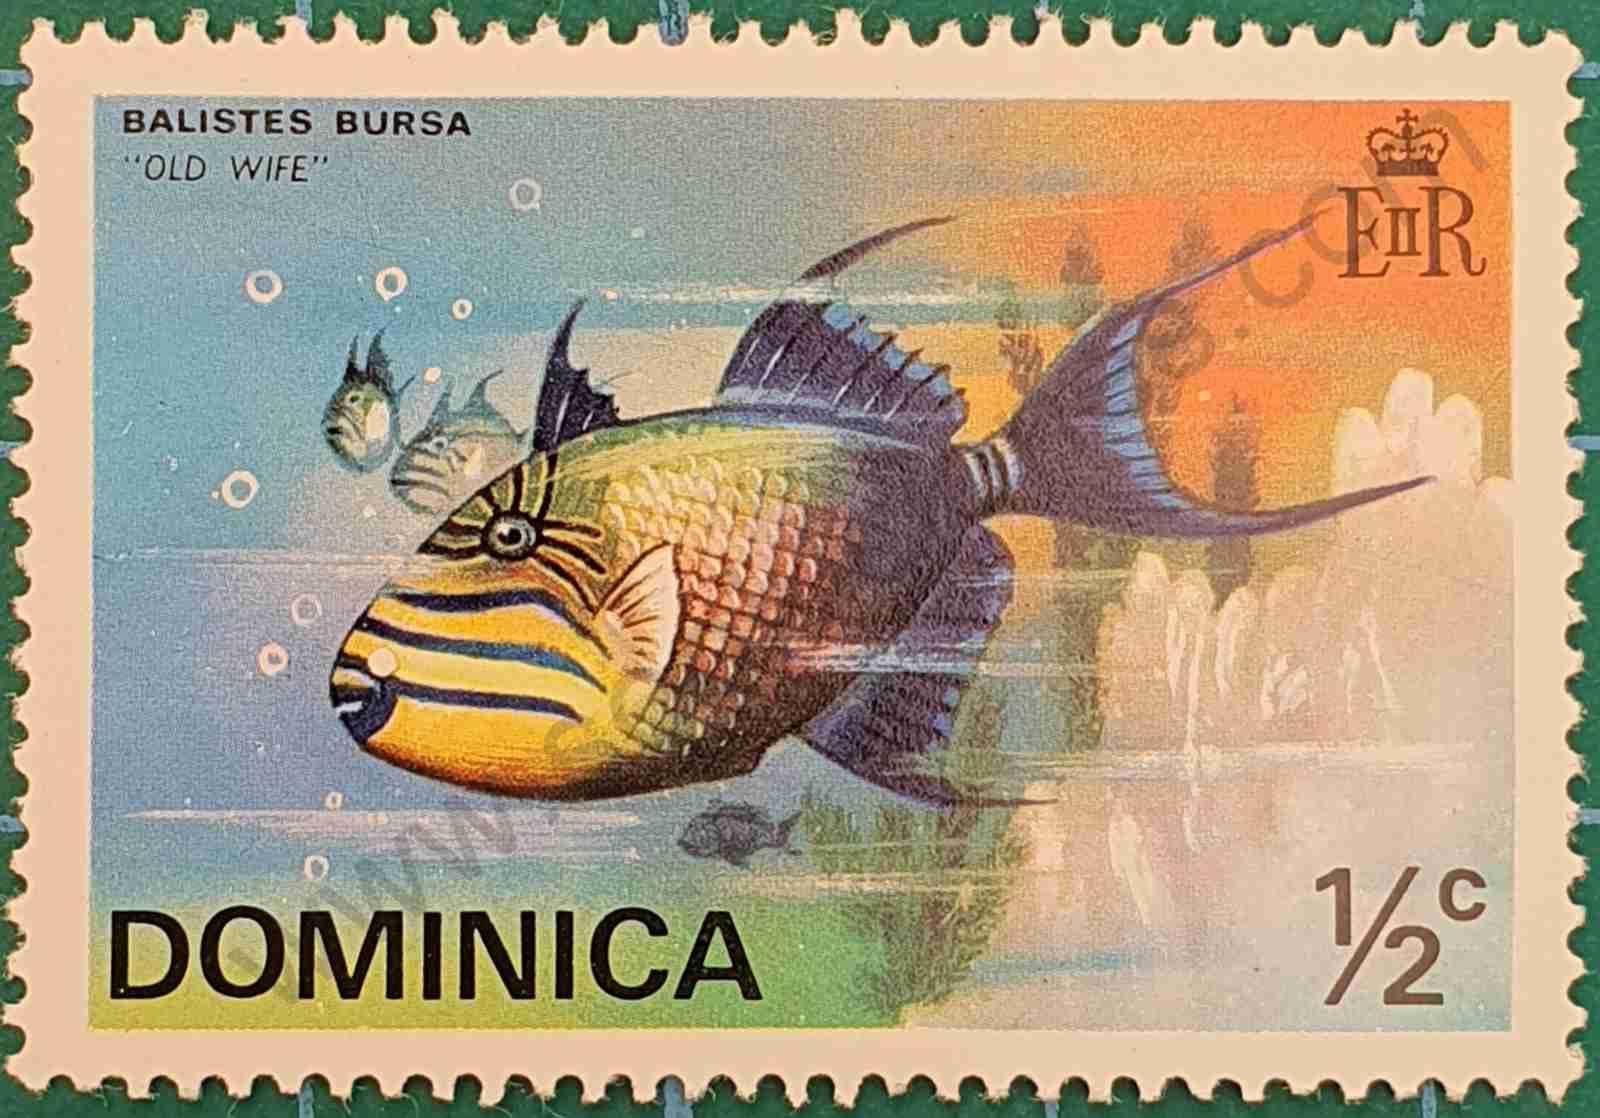 Pez ballesta - sello Dominica 1975